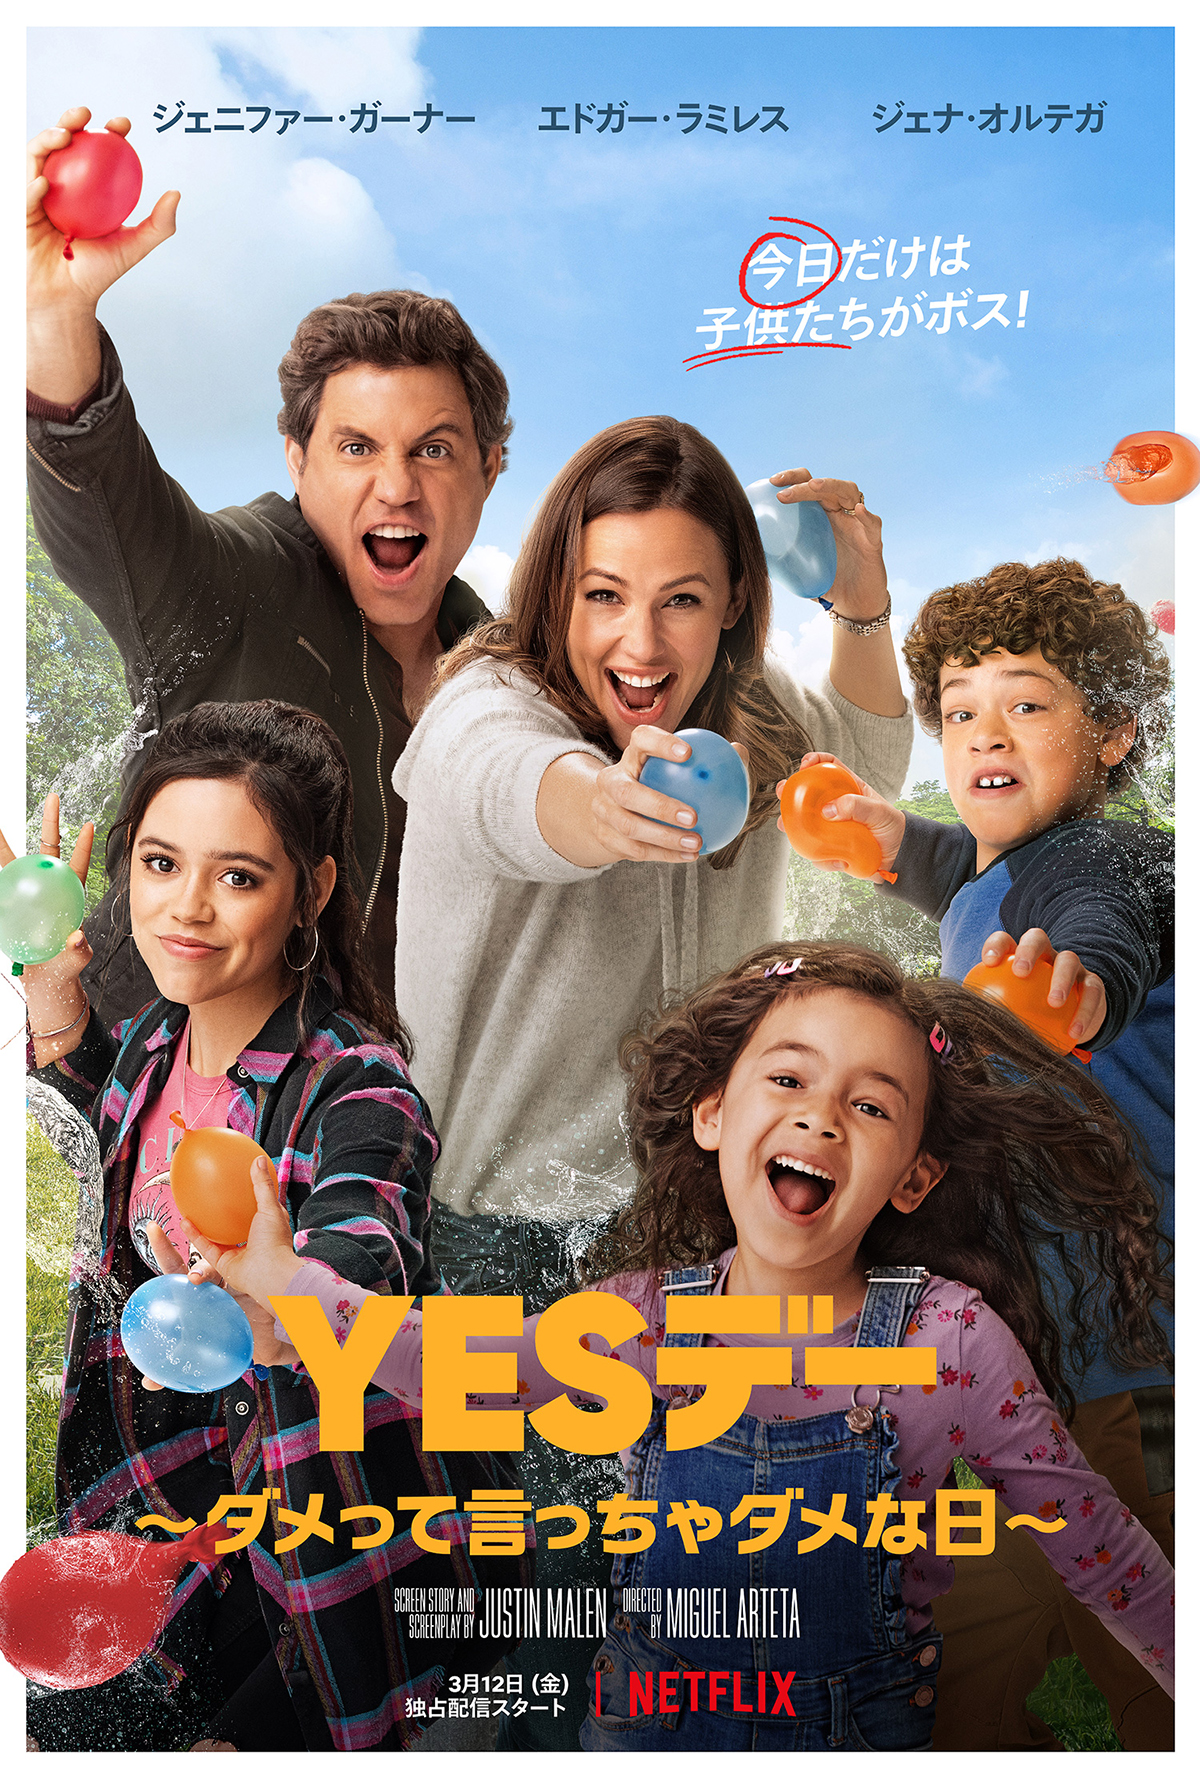 photo : Netflix Netflix映画『YESデー ~ダメって言っちゃダメな日~』Netflixにて独占配信中